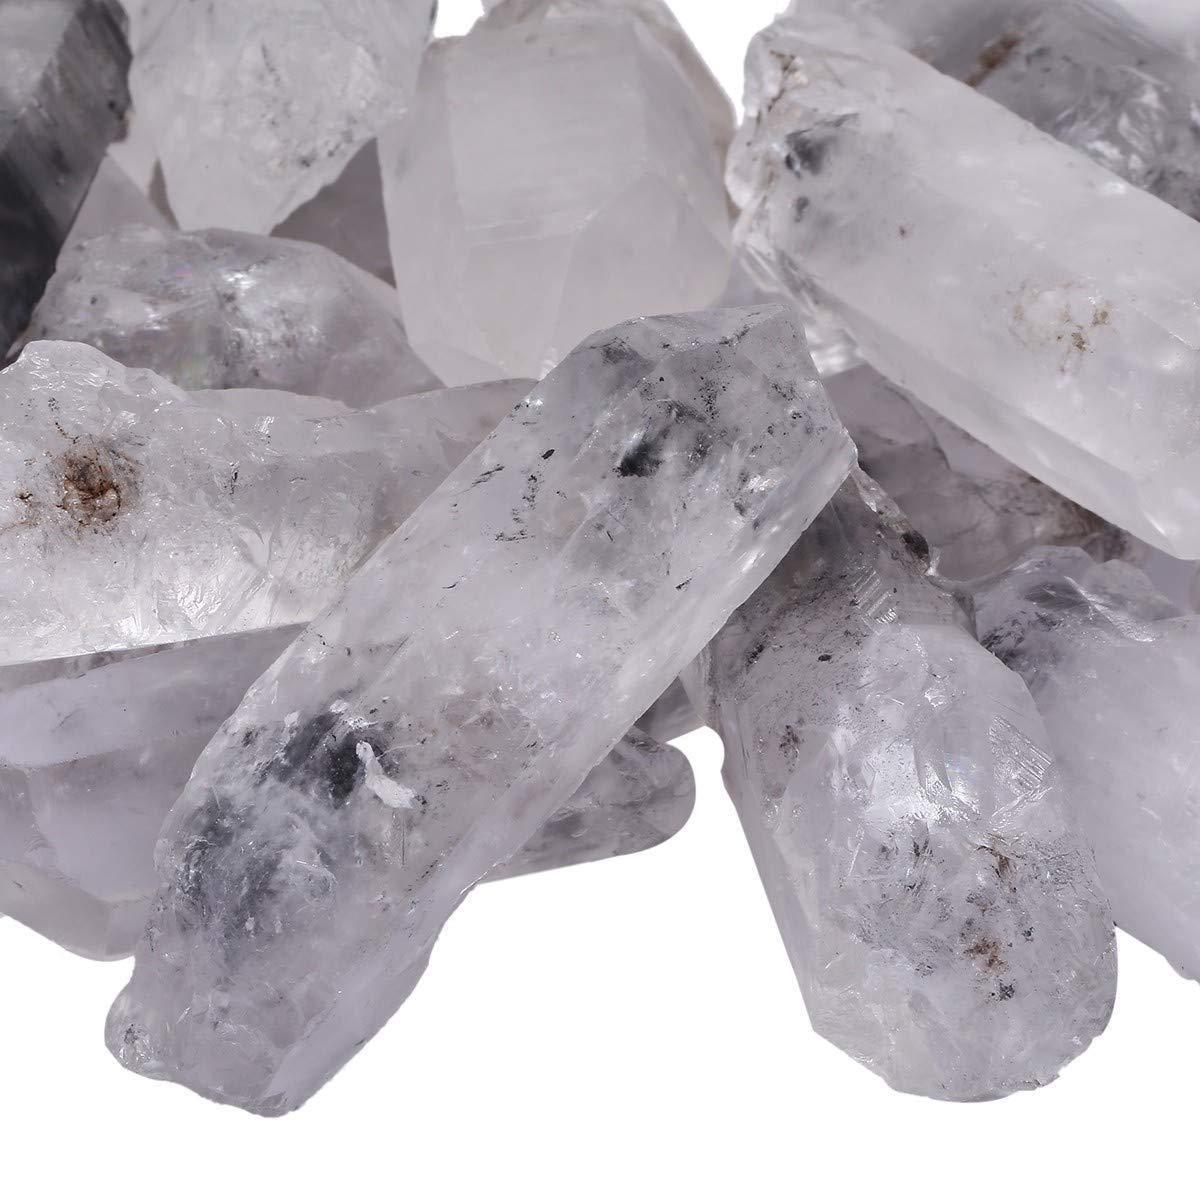 rockcloud 1//2 lb Natural Rough Rock Quartz Crystal Point for Jewelry Making RCZ0010101